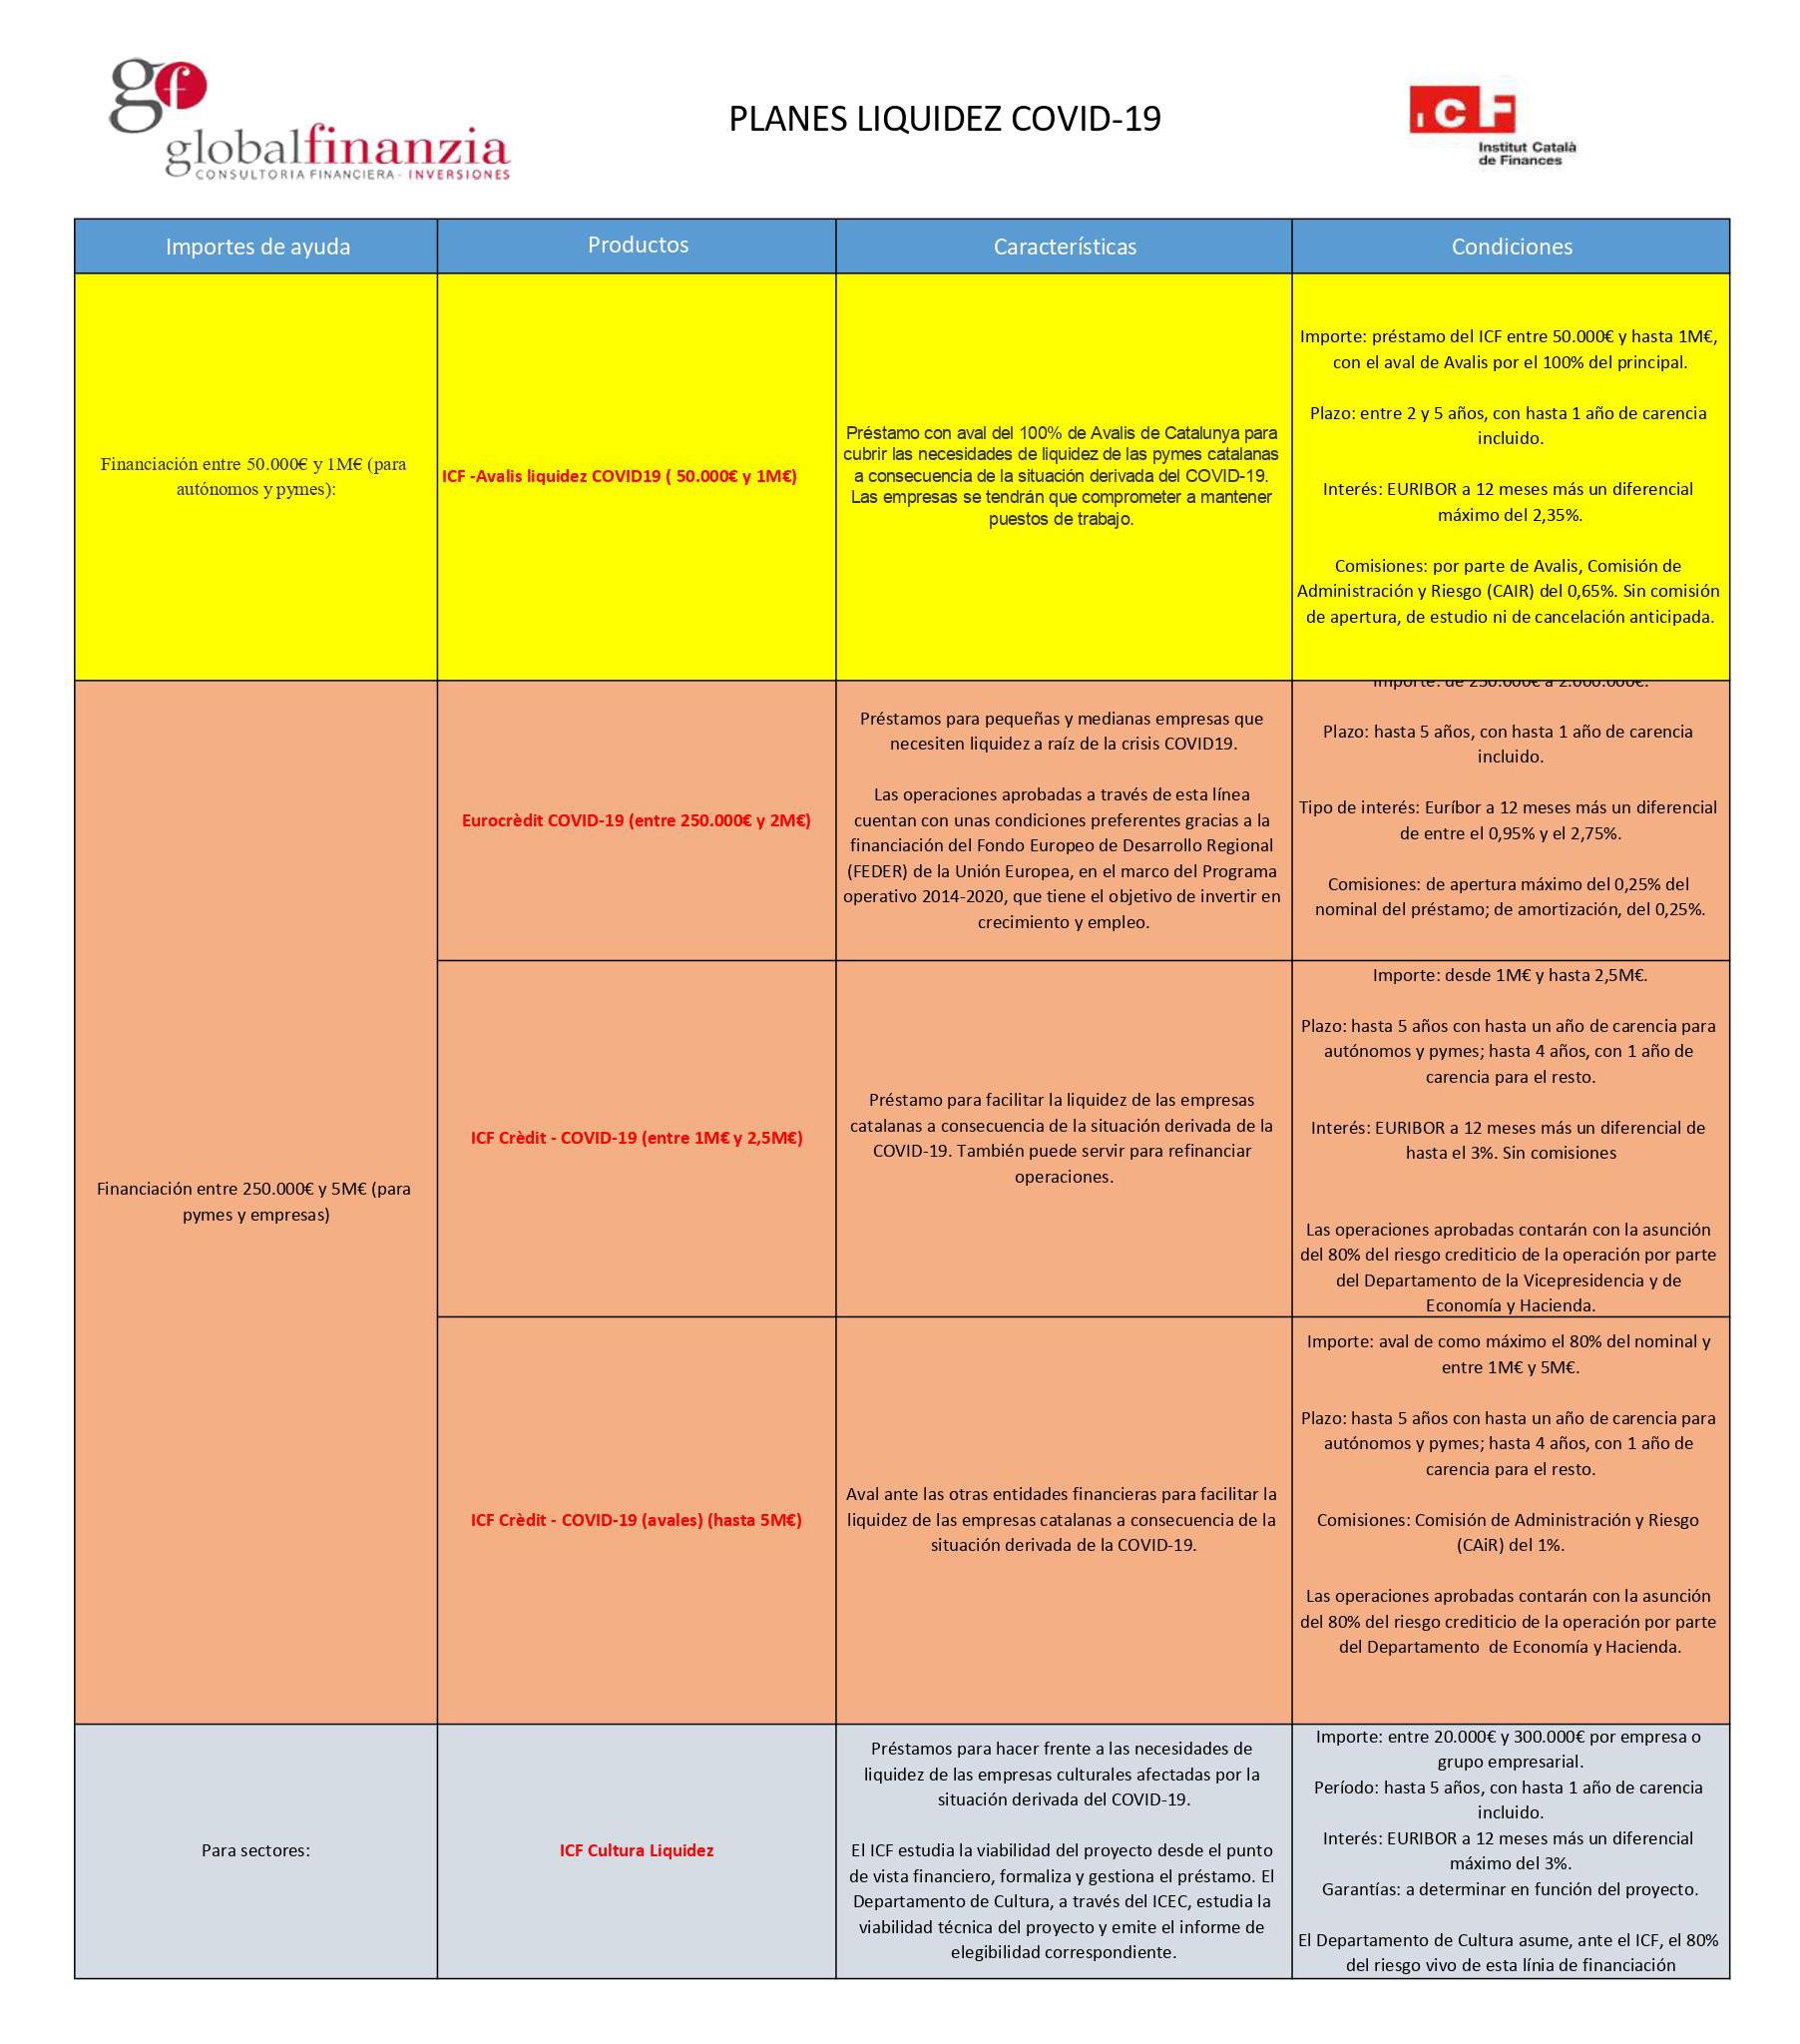 planes-icf-covid-19-globalfinanzia